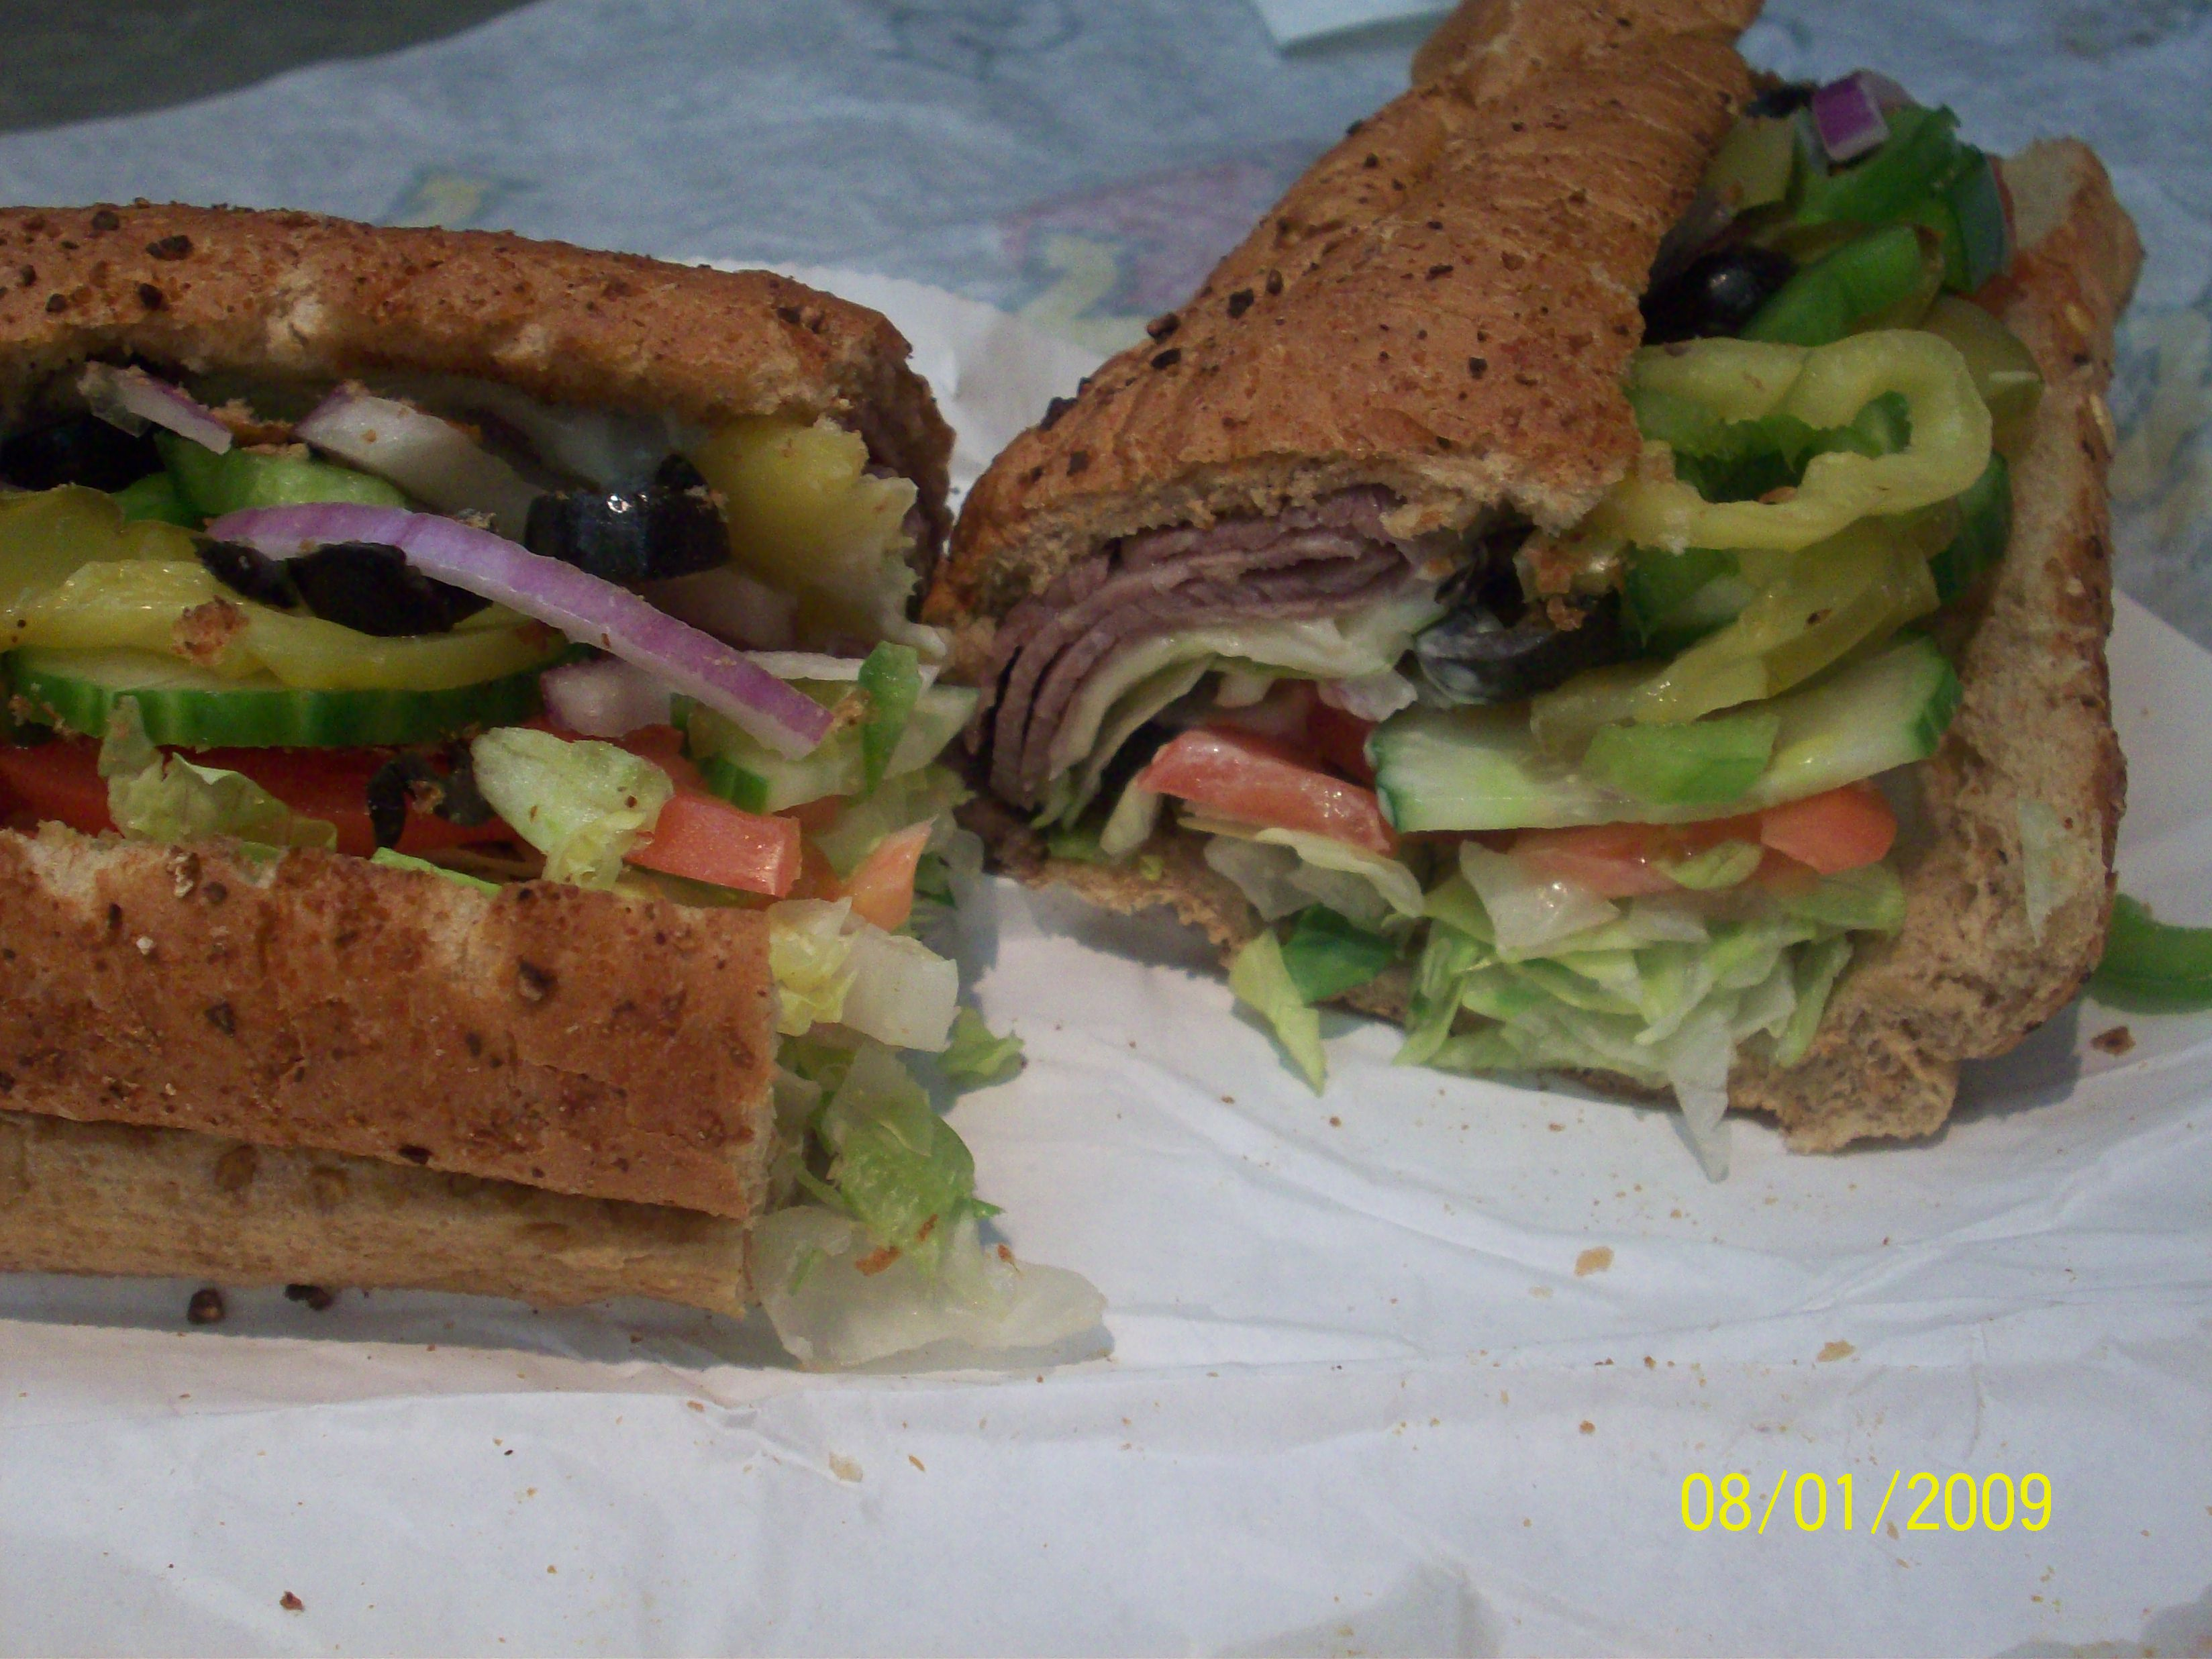 https://foodloader.net/cutie_2009-01-09_Subway_Roast_Beef_Sandwich.jpg